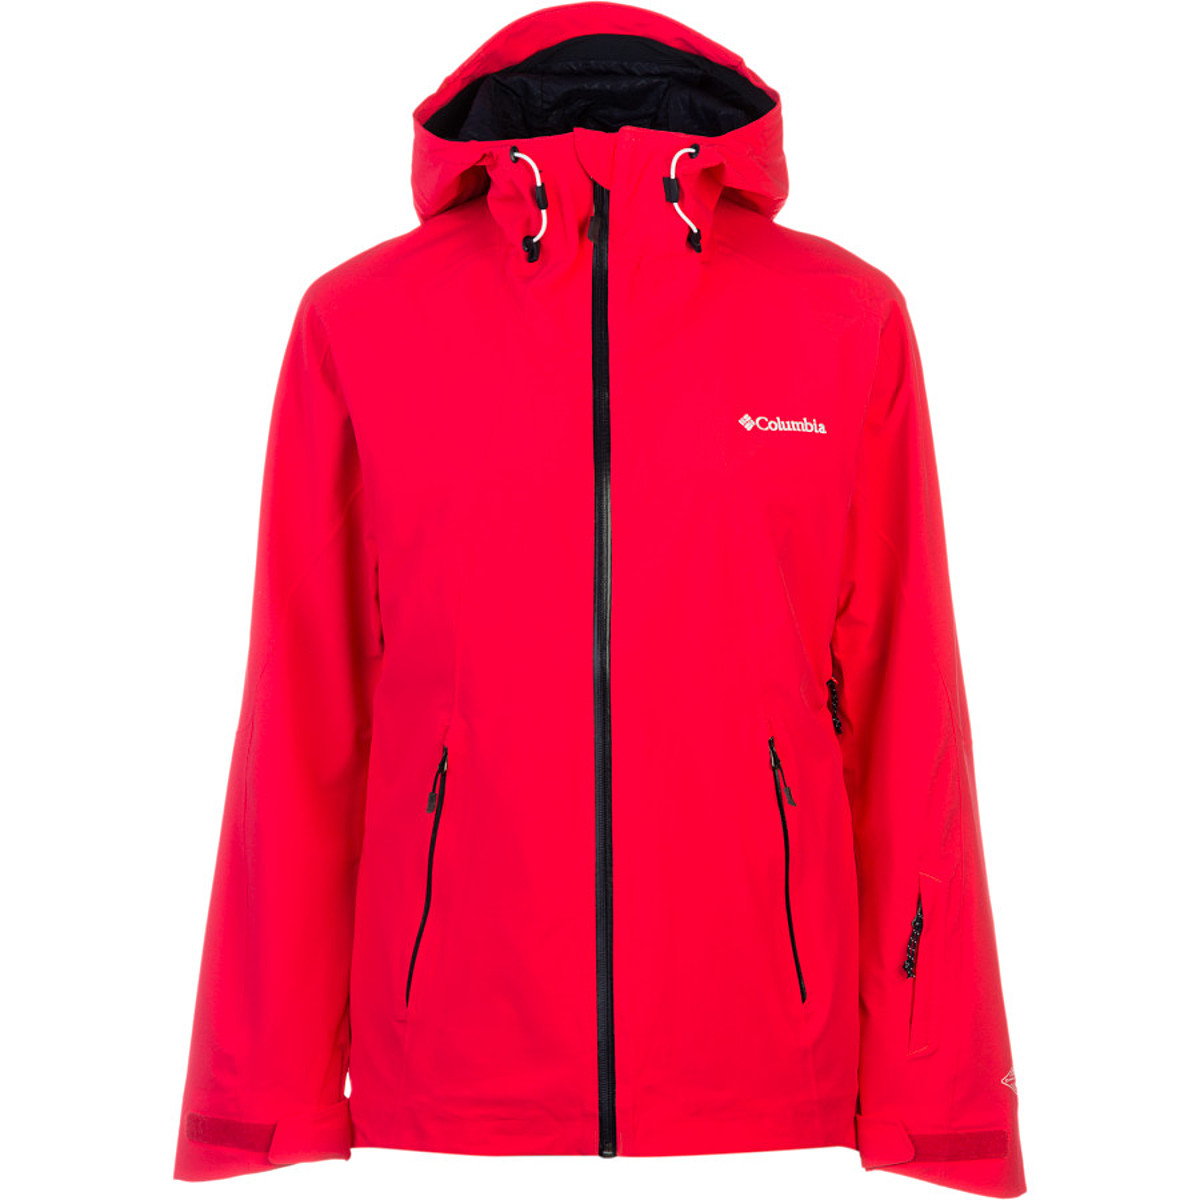 Columbia Millennium Flash Shell Jacket